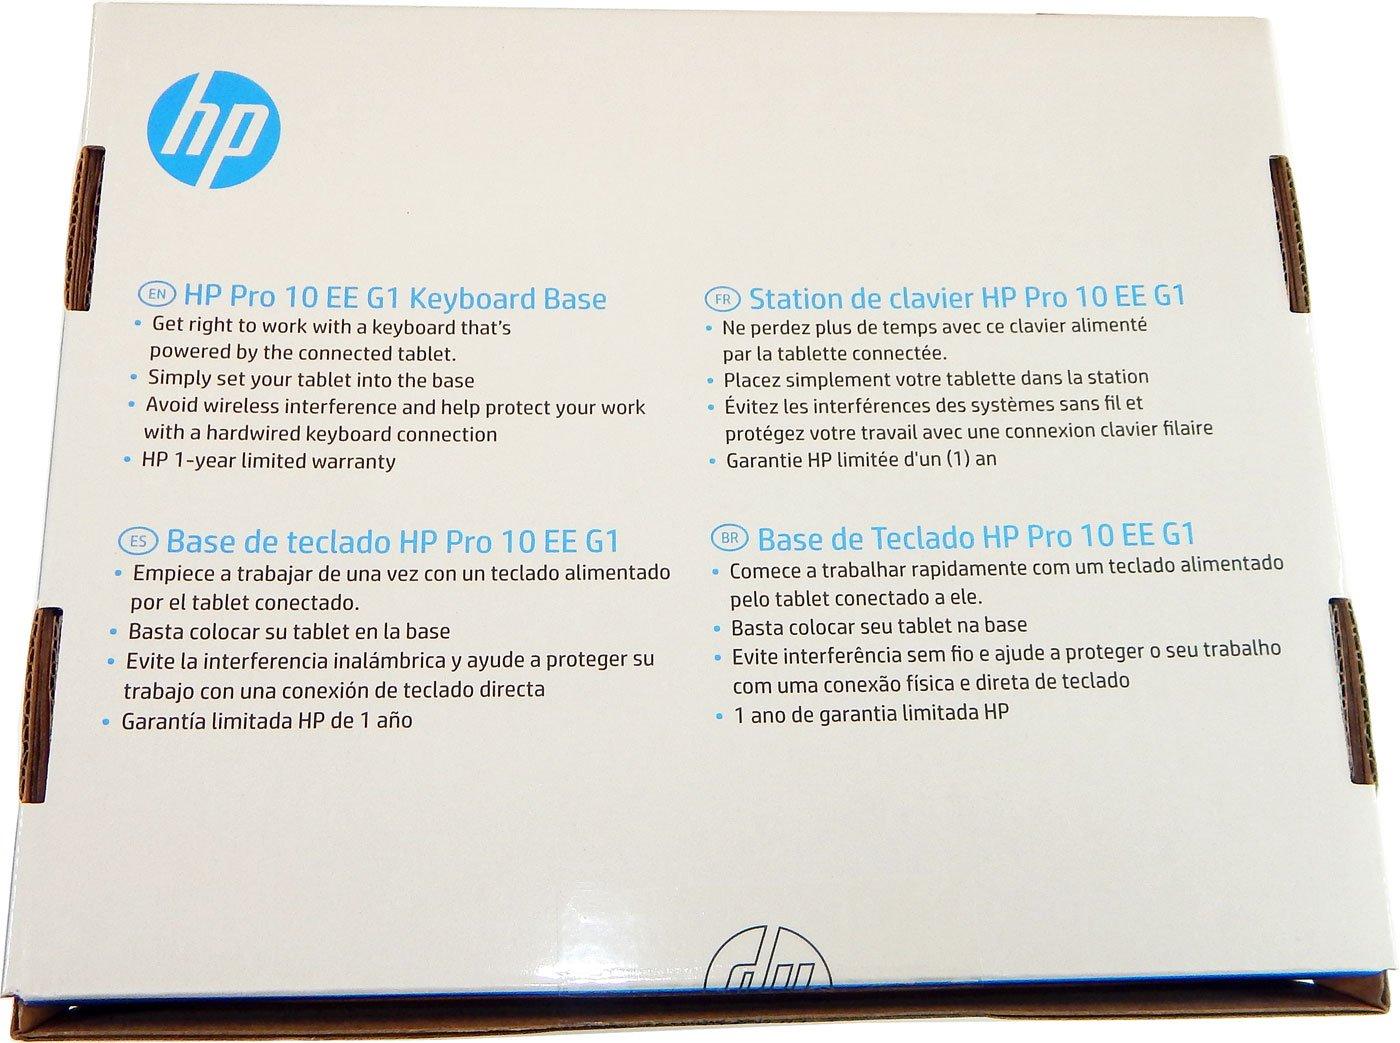 Amazon.com: HP Pro 10 EE G1 Keyboard Base Spanish K7N19AA#ABM: Computers & Accessories